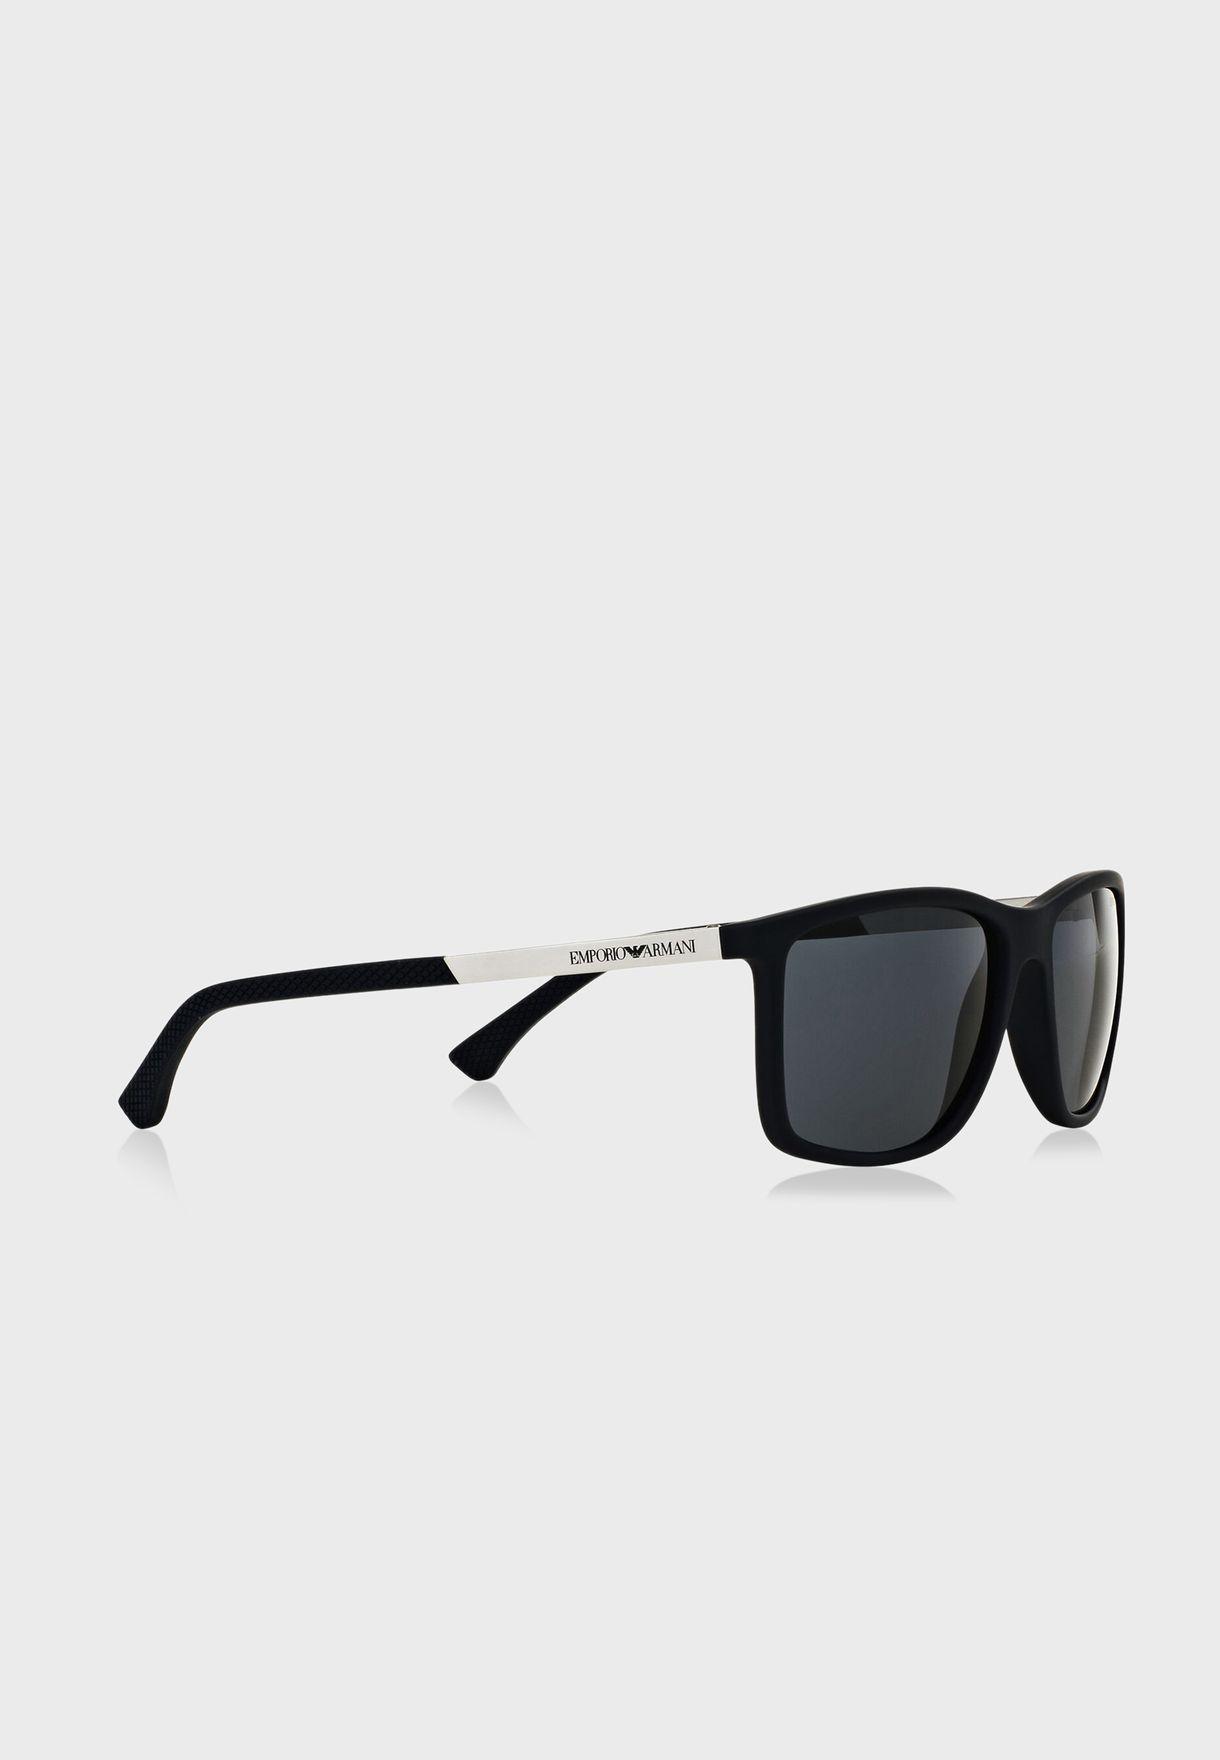 نظارة شمسية واي فيرر0EA4058